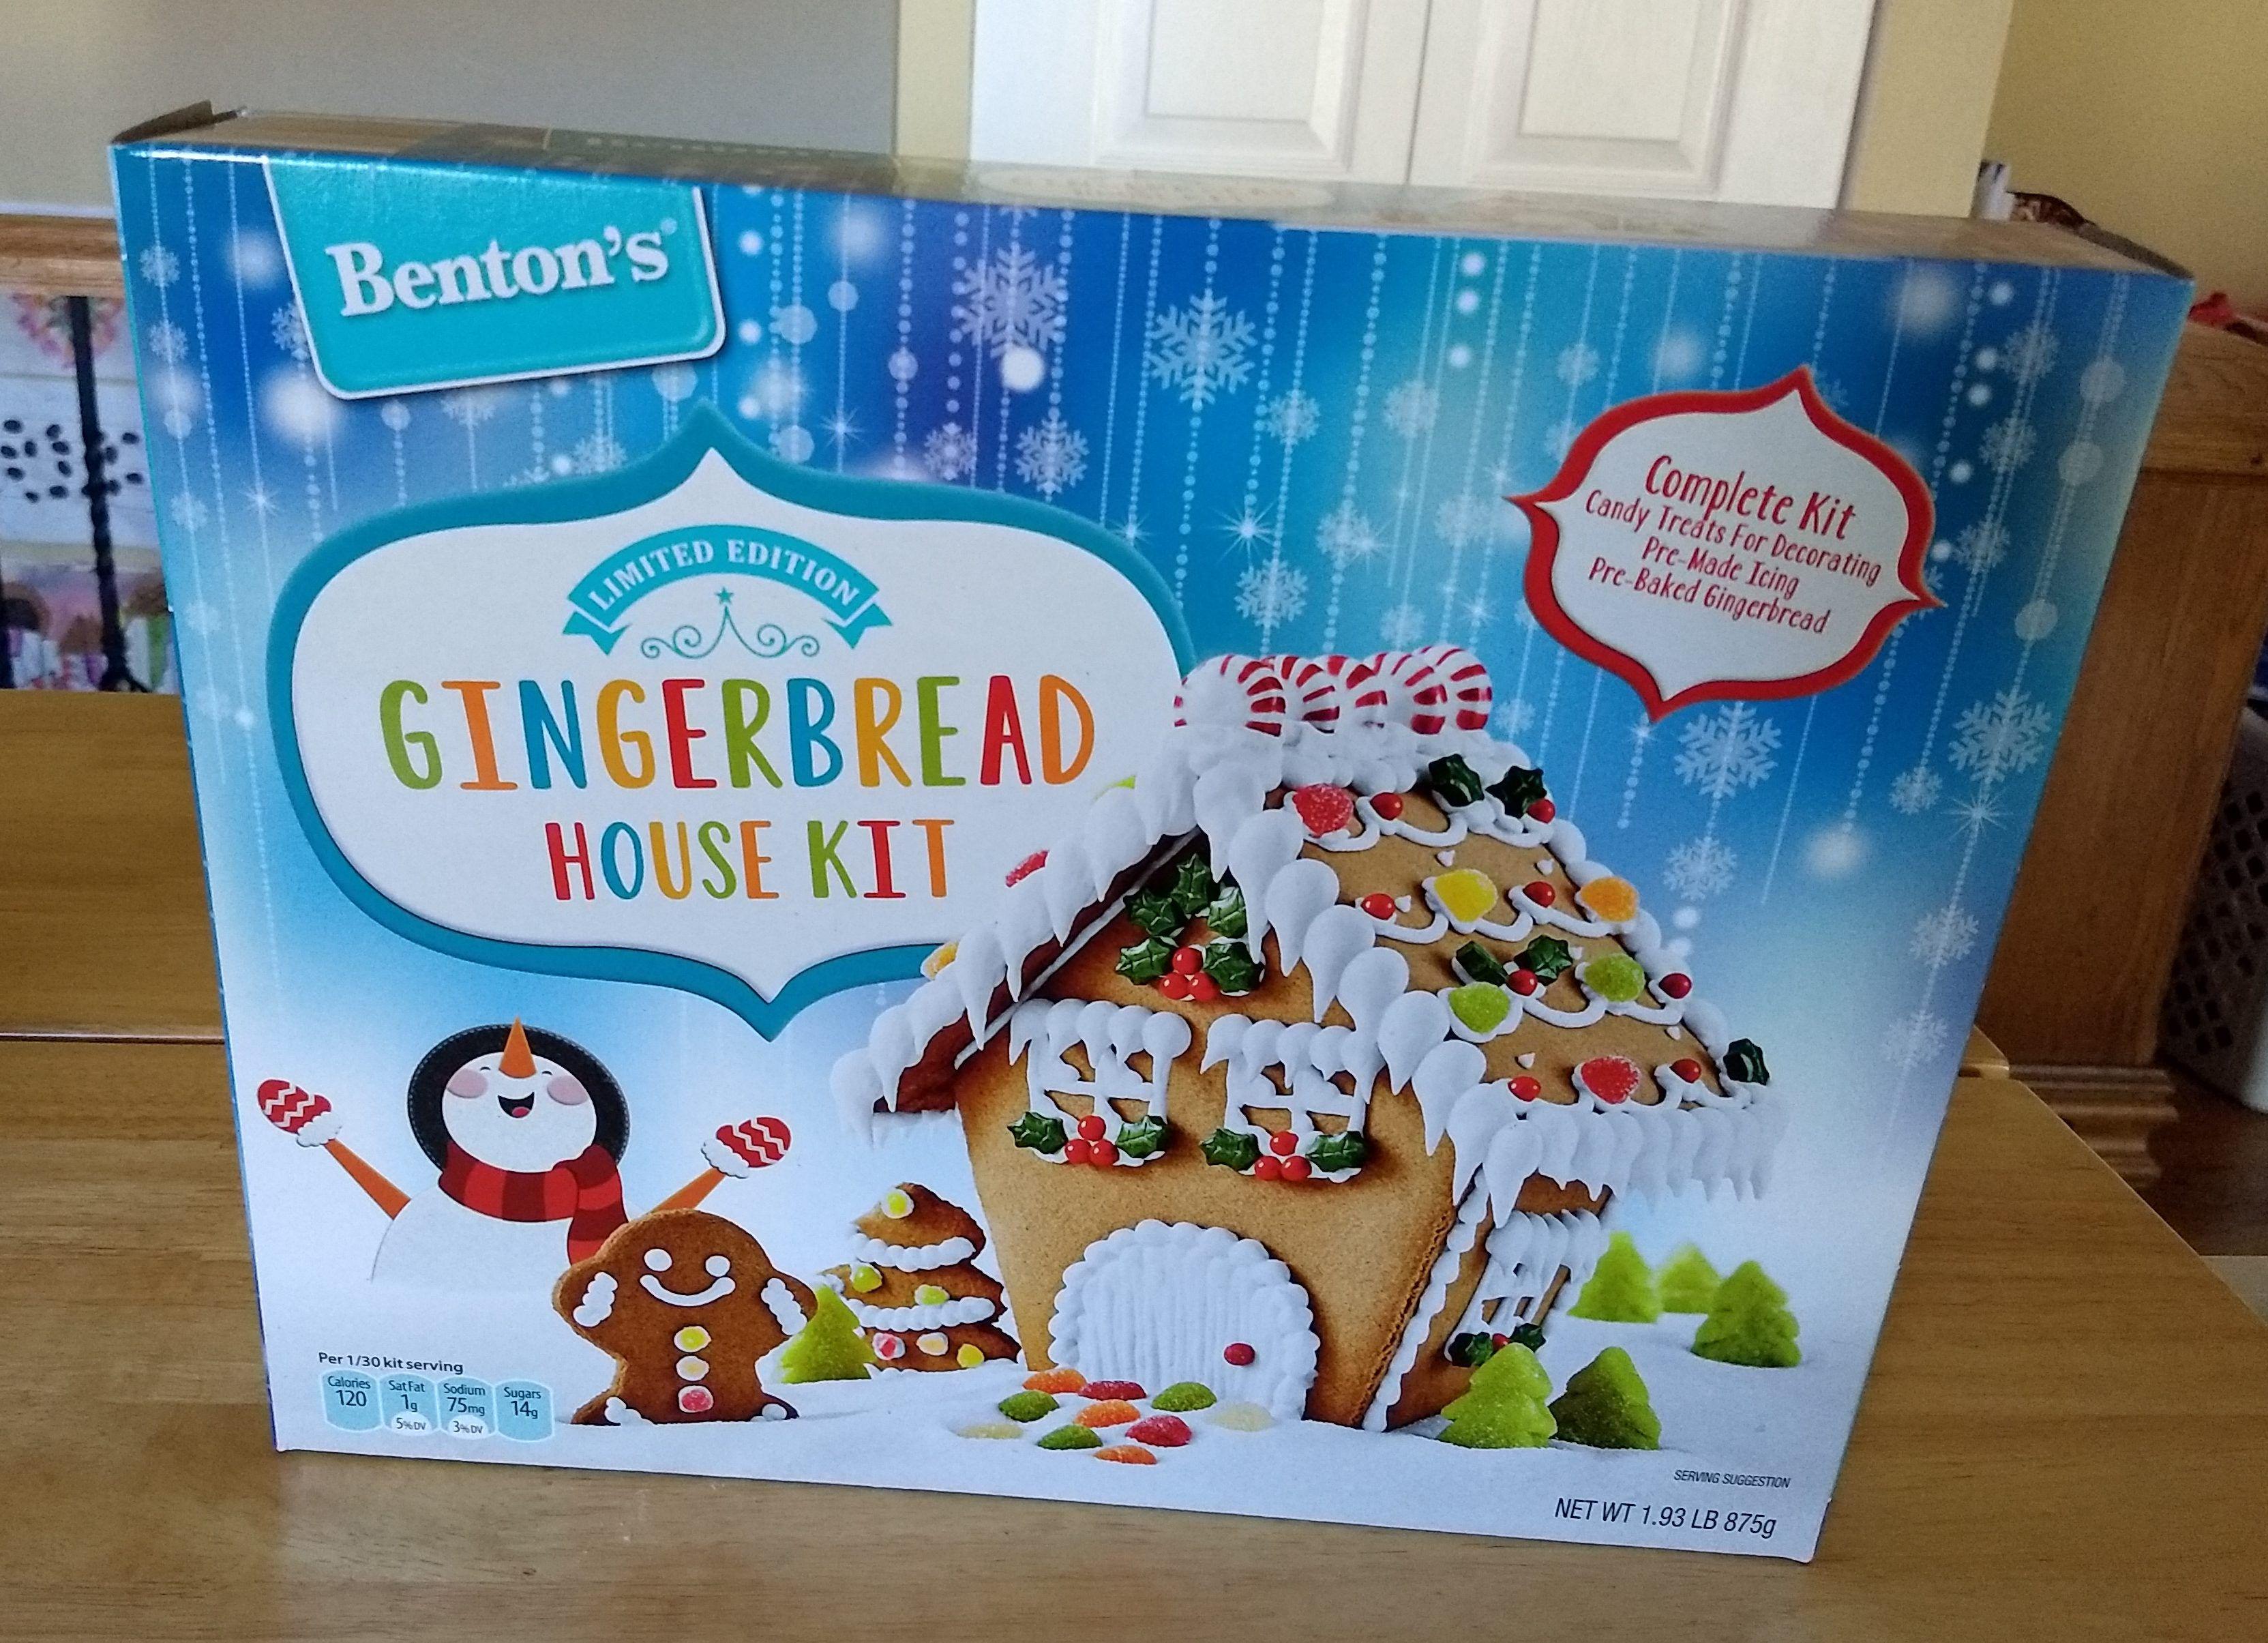 Benton's Gingerbread House Kit Gingerbread house kits